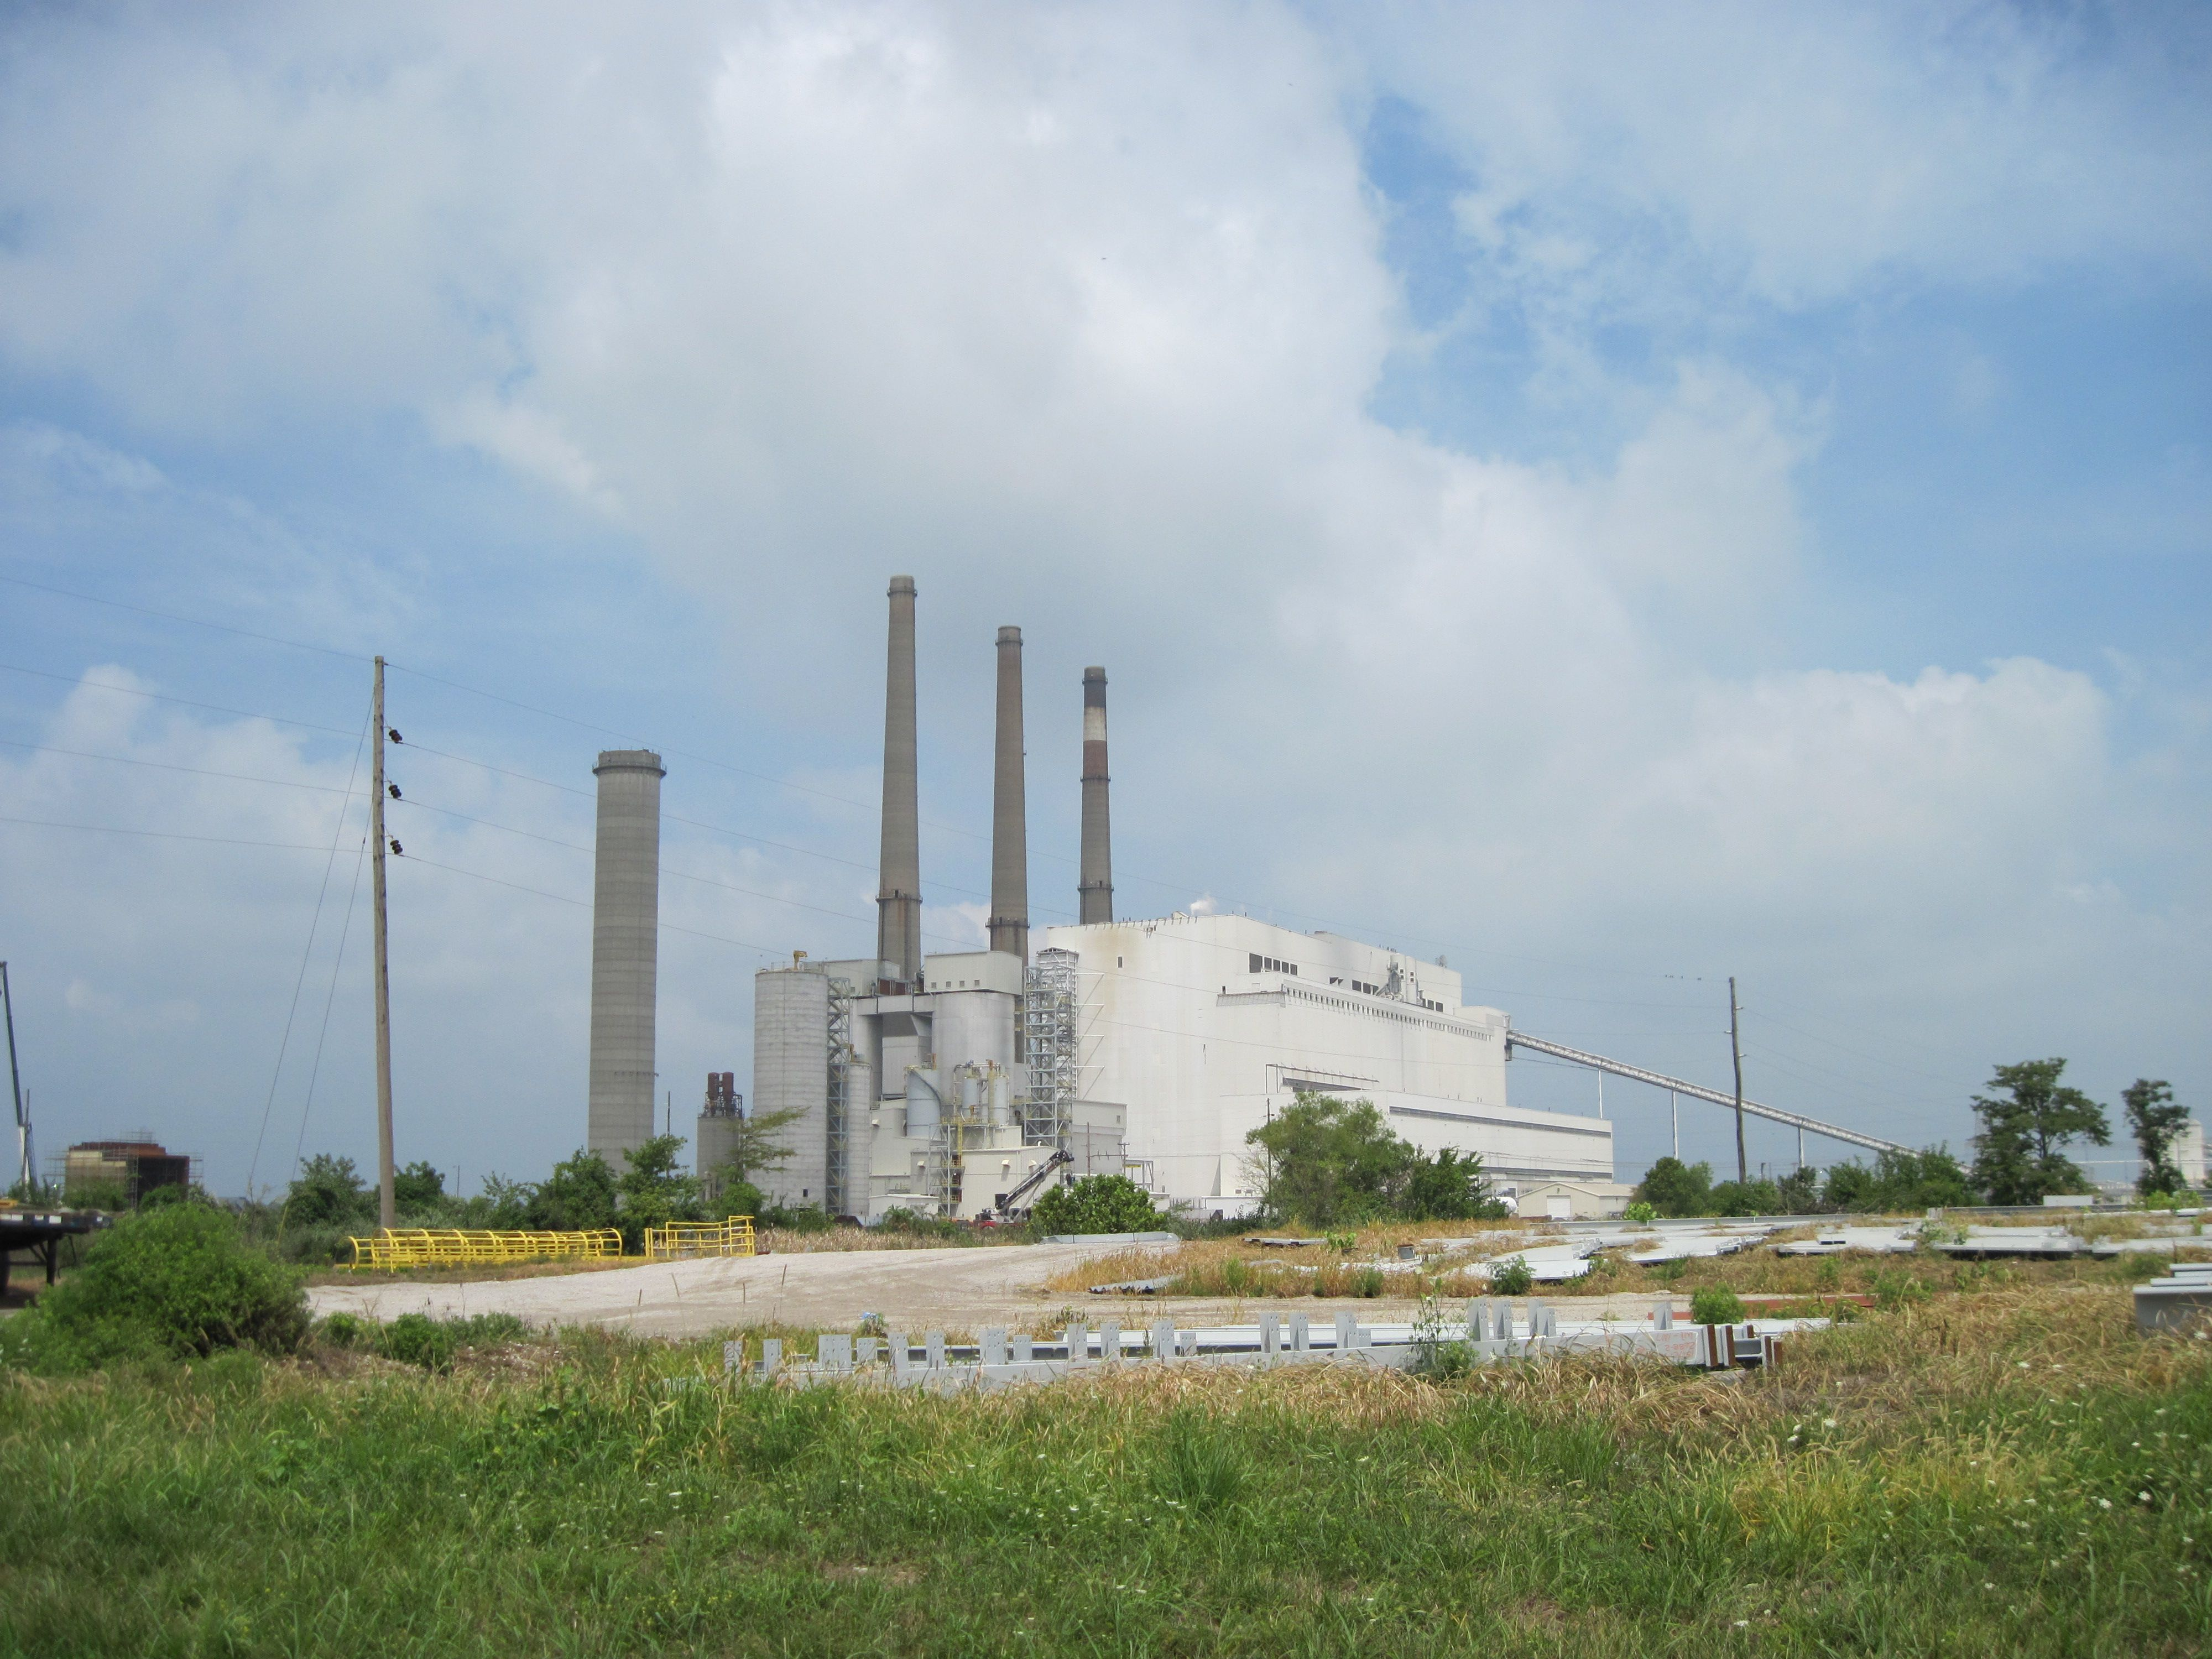 Illinois randolph county baldwin - Dynegy S Baldwin Energy Complex Photo Courtesy Of Christopher Martin Randolph County Il